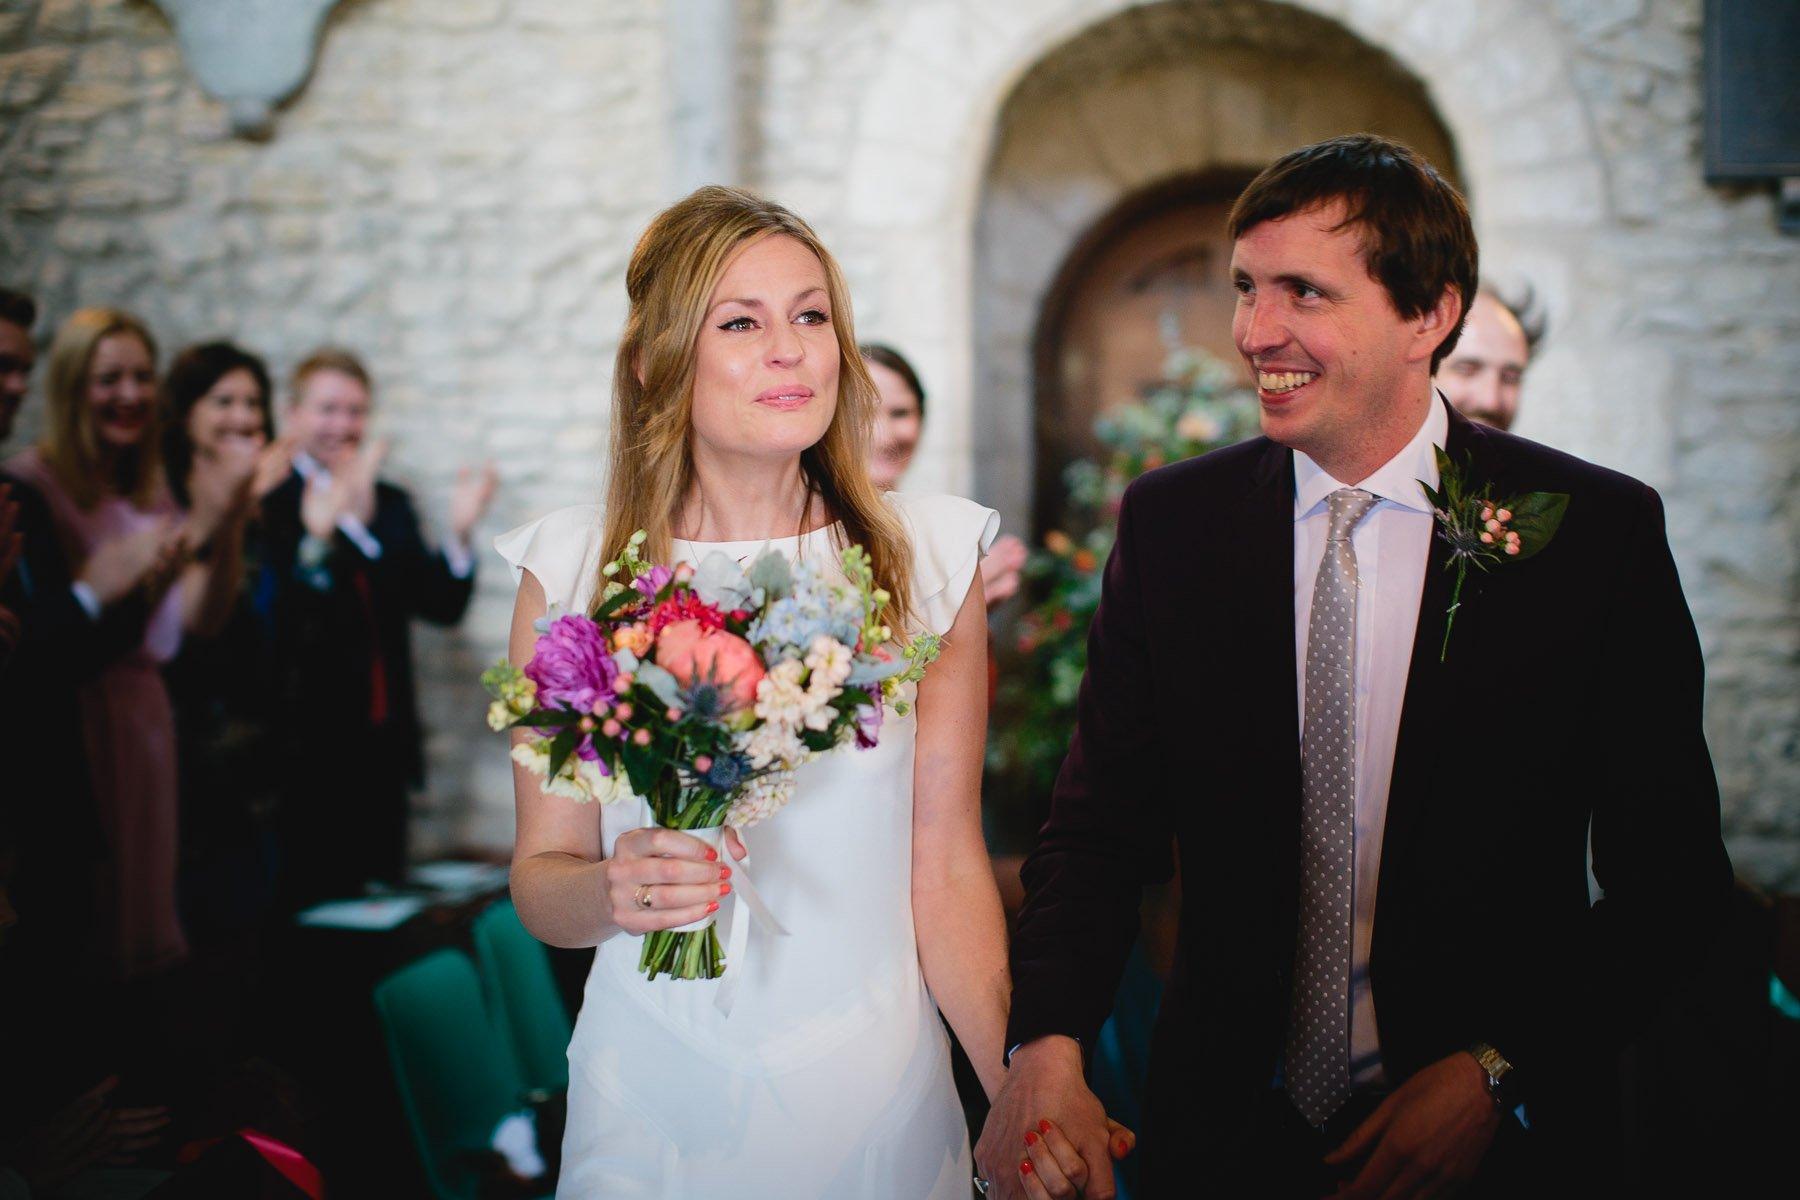 Buckinghamshire-Wedding-Lizzie-Duncan-073